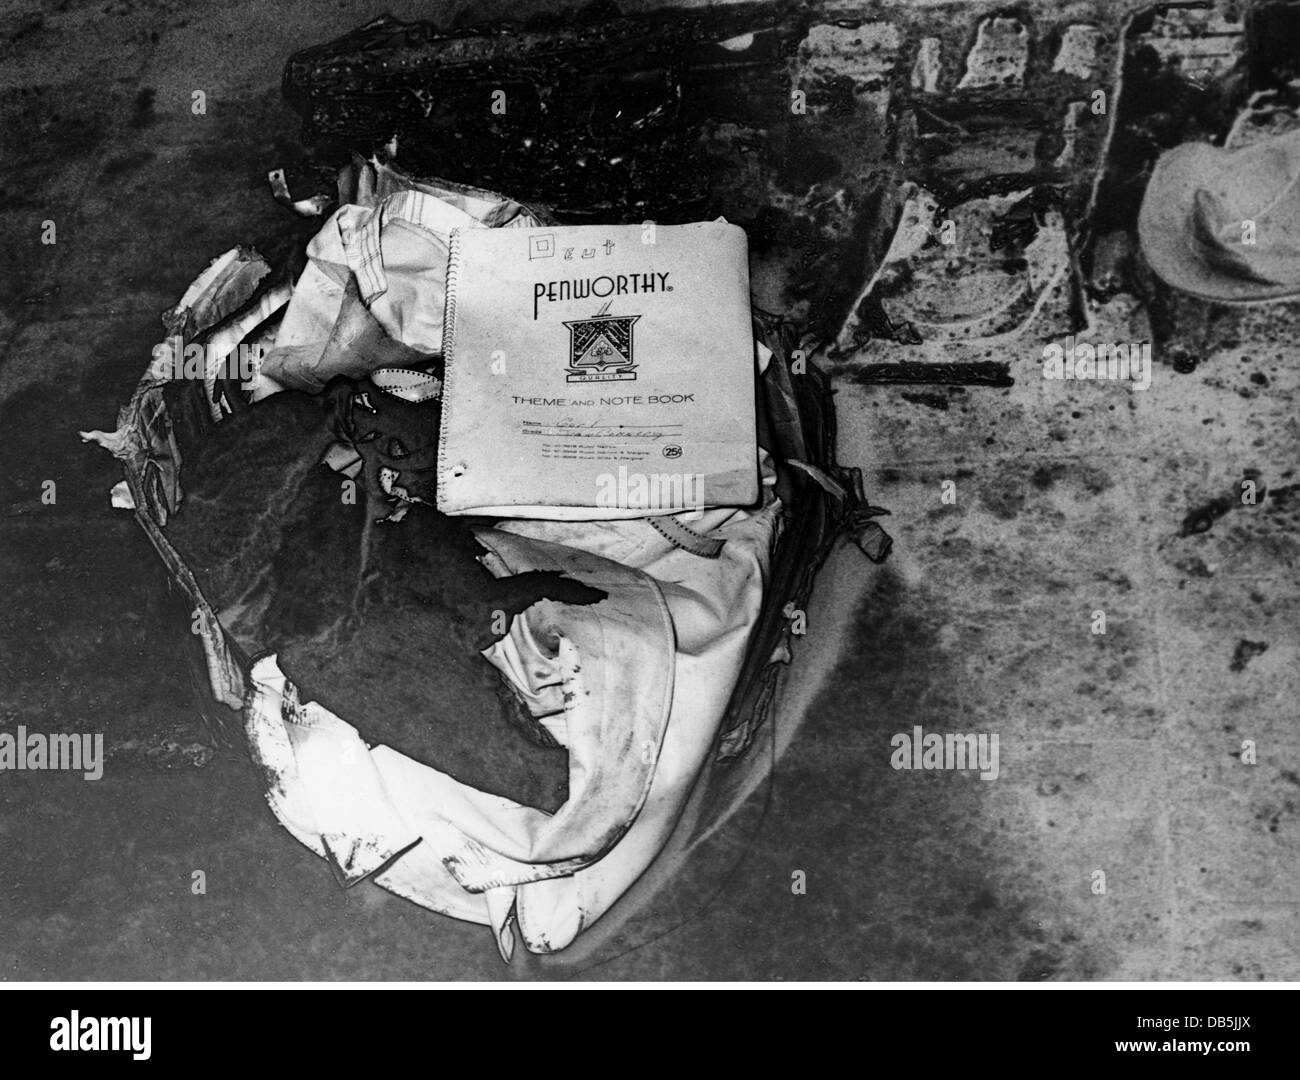 transport / transportation, aviation, disasters, Munich air disaster, crash of British European Airways Flight 609, - Stock Image